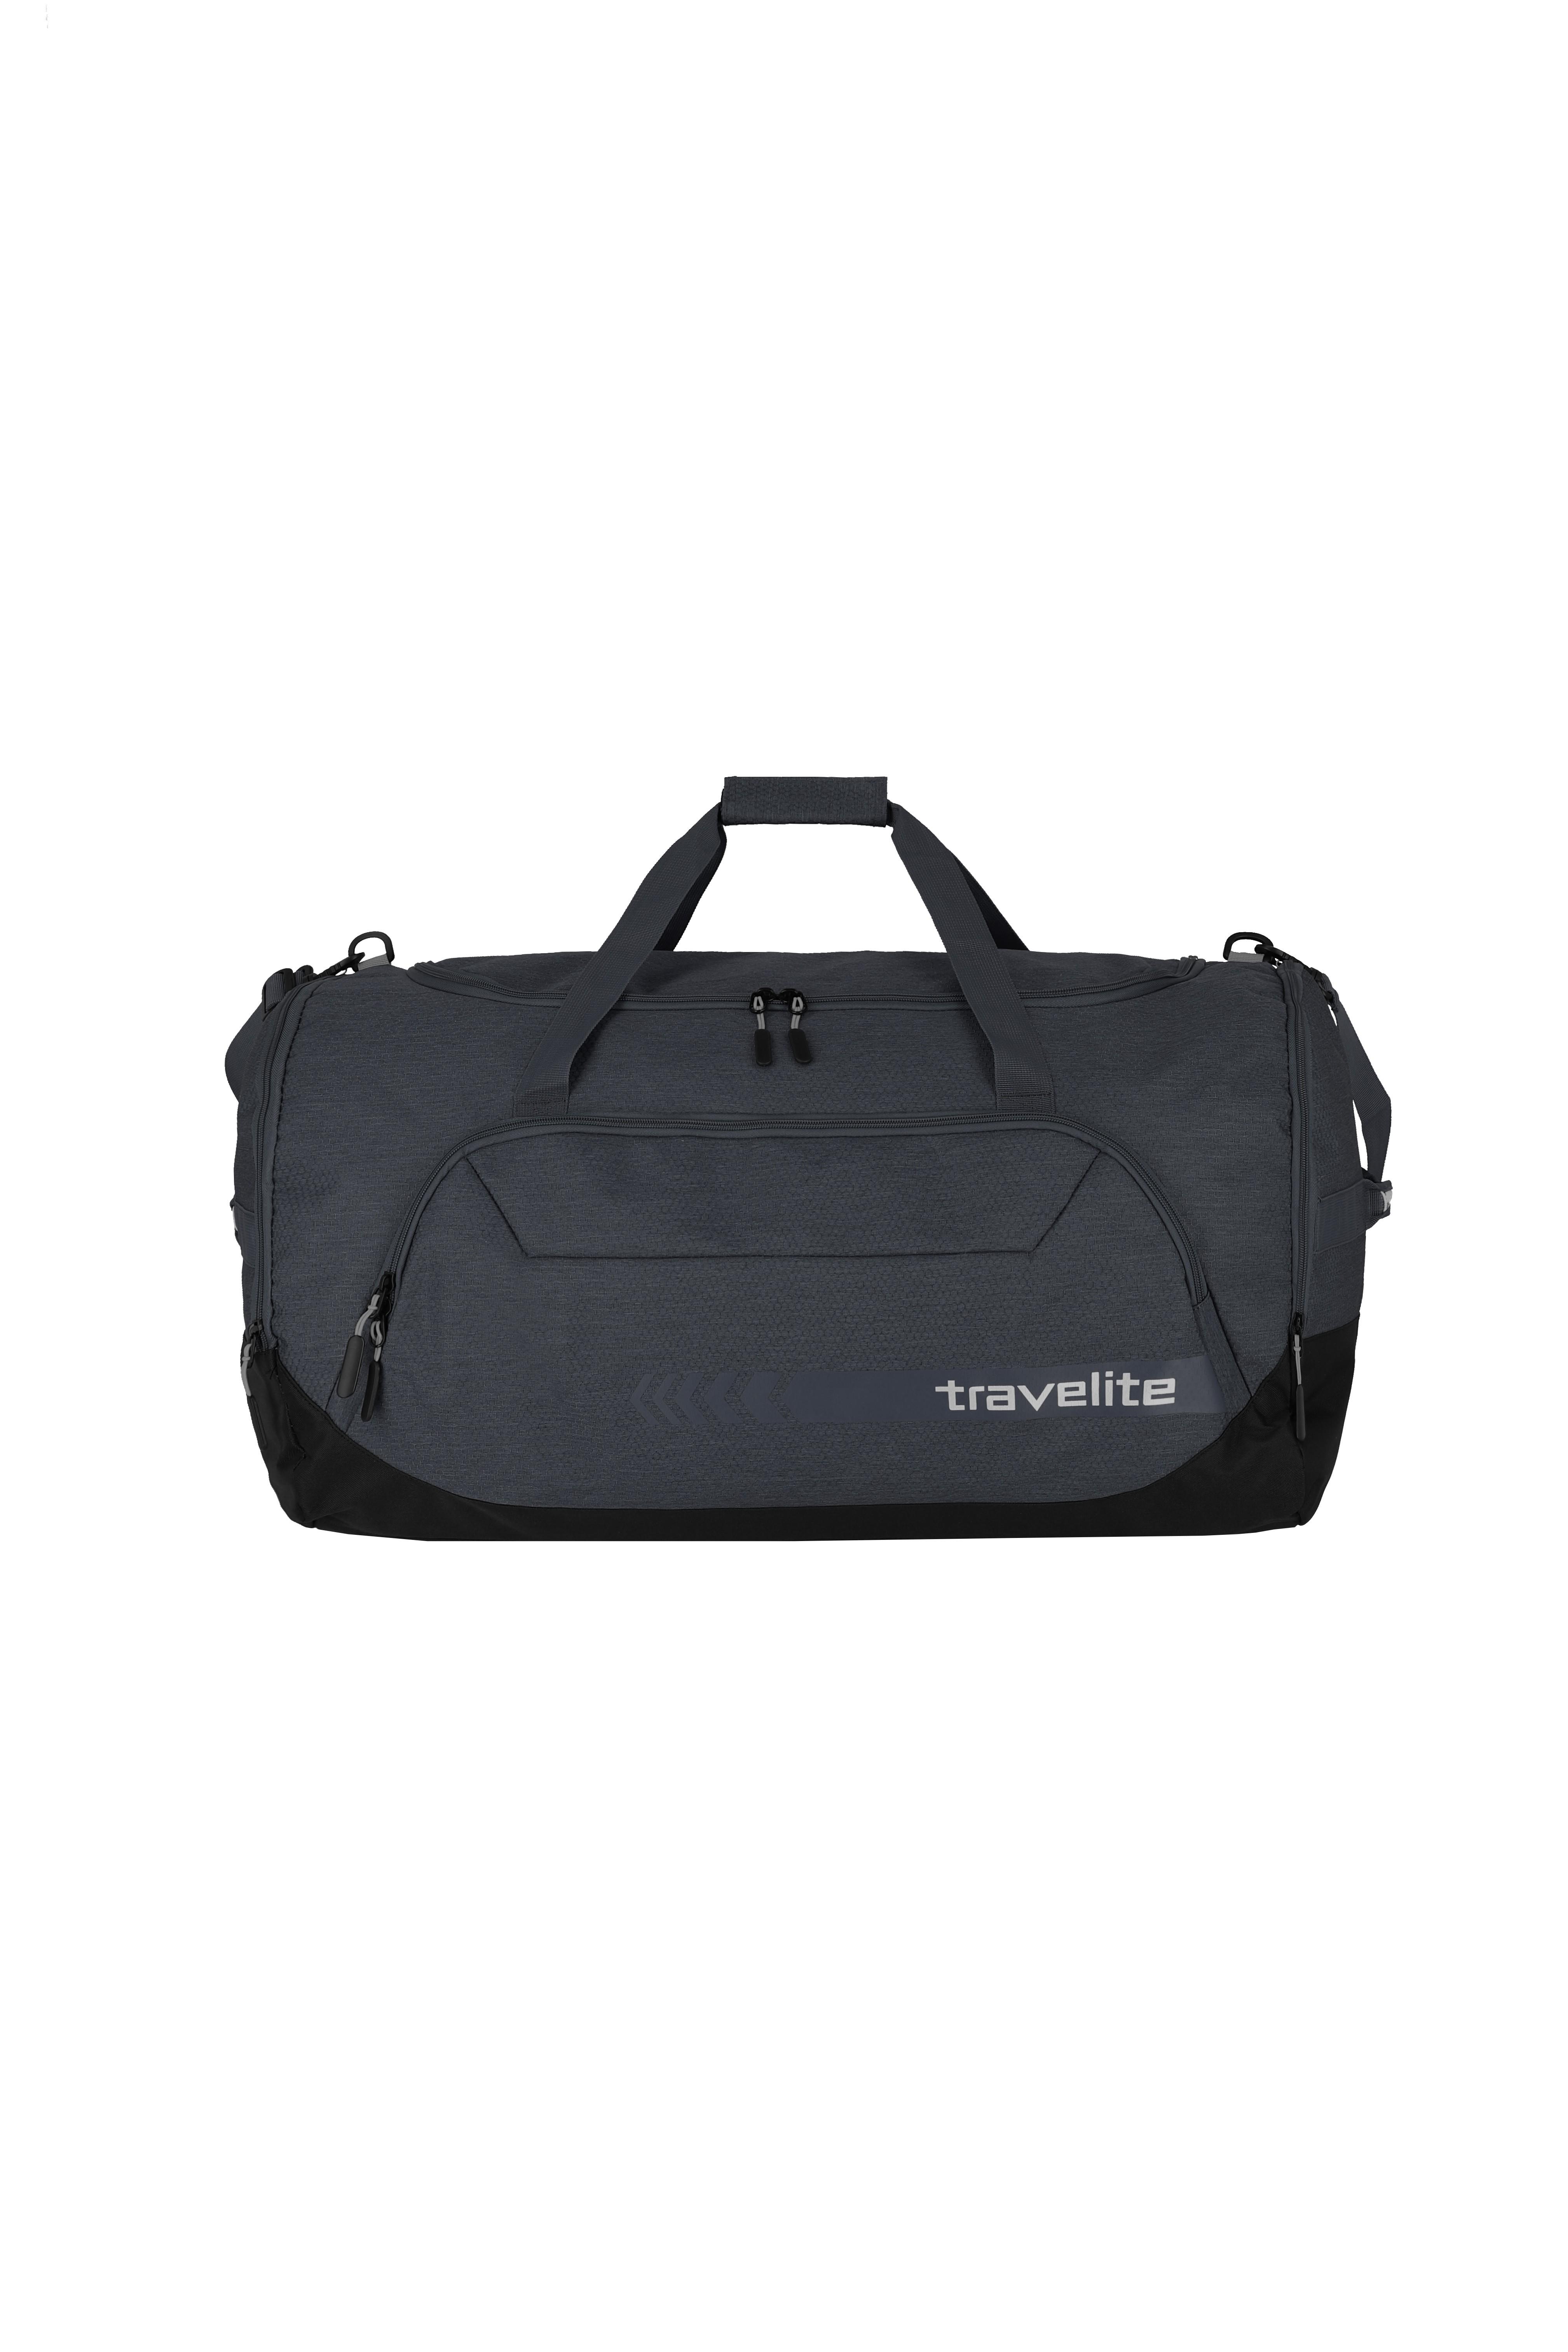 Travelite Kick Off XL Antracite